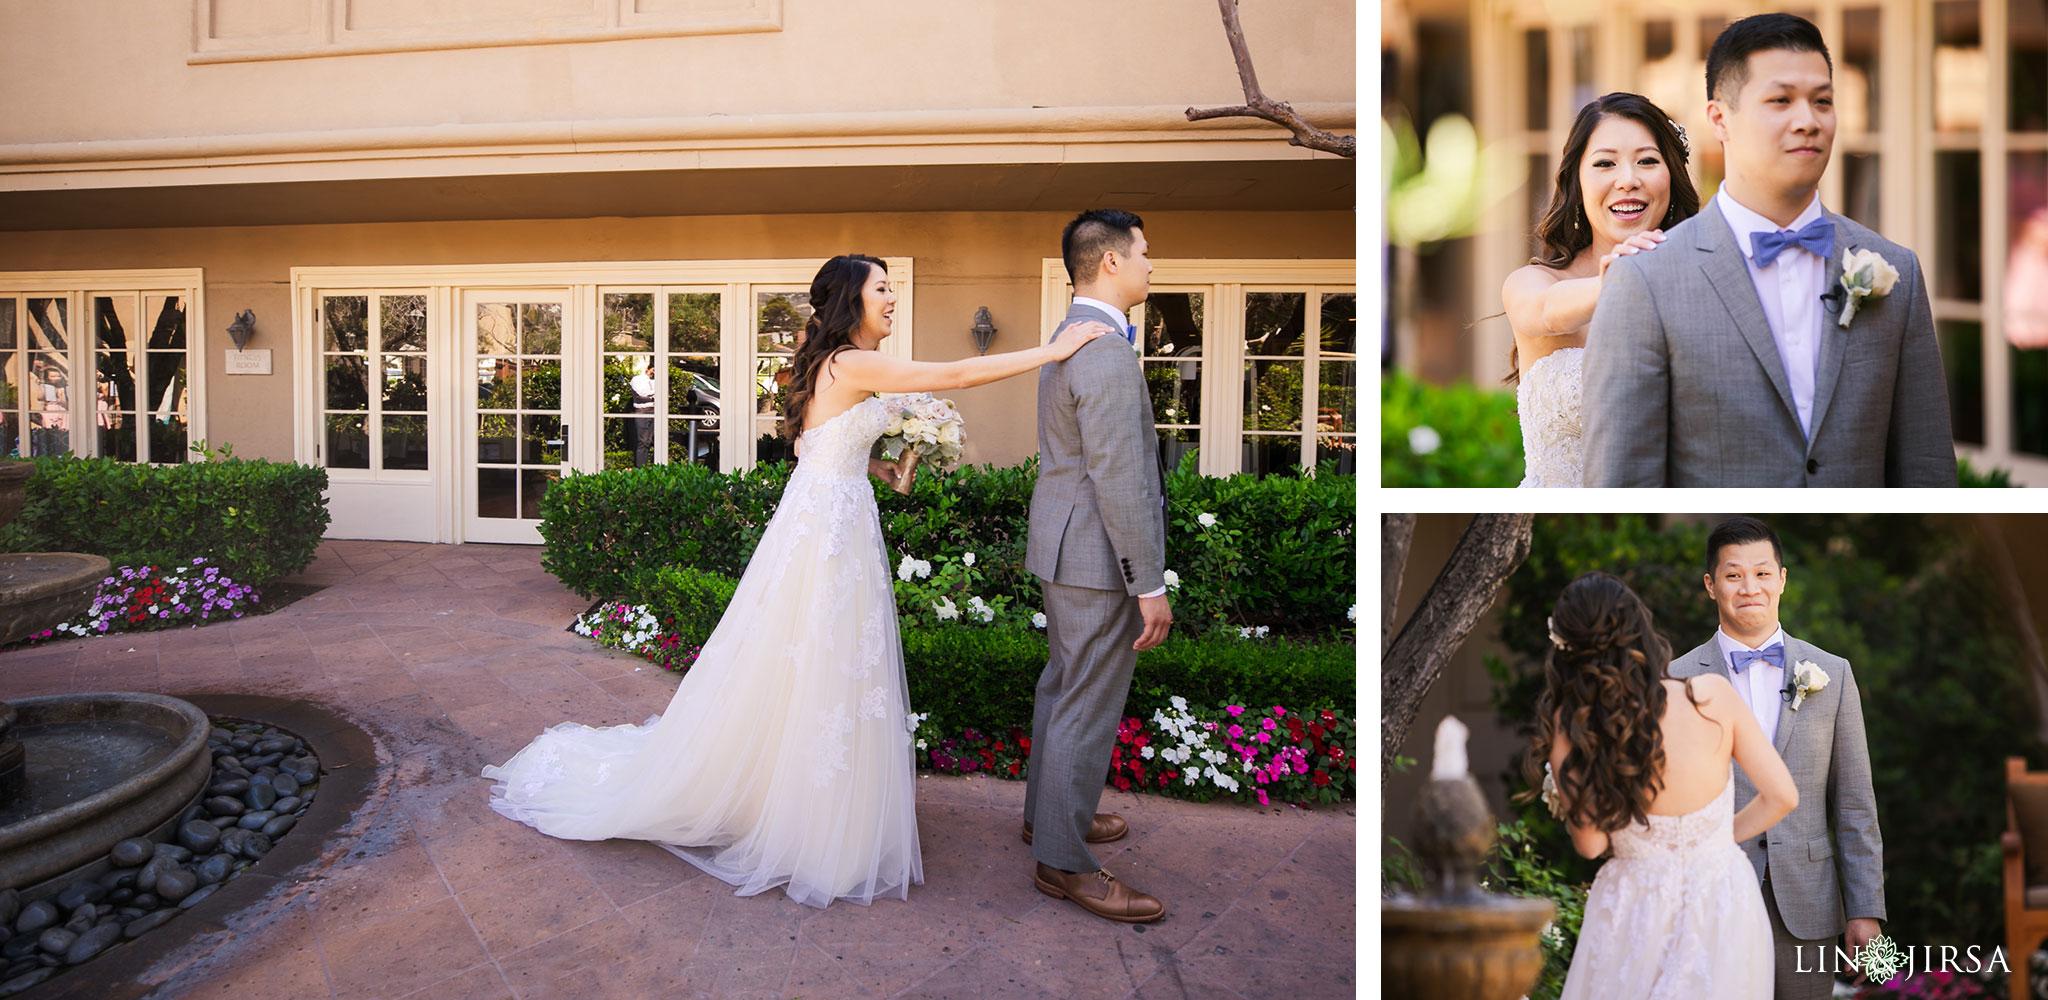 010 surf and sand resort laguna beach wedding photography